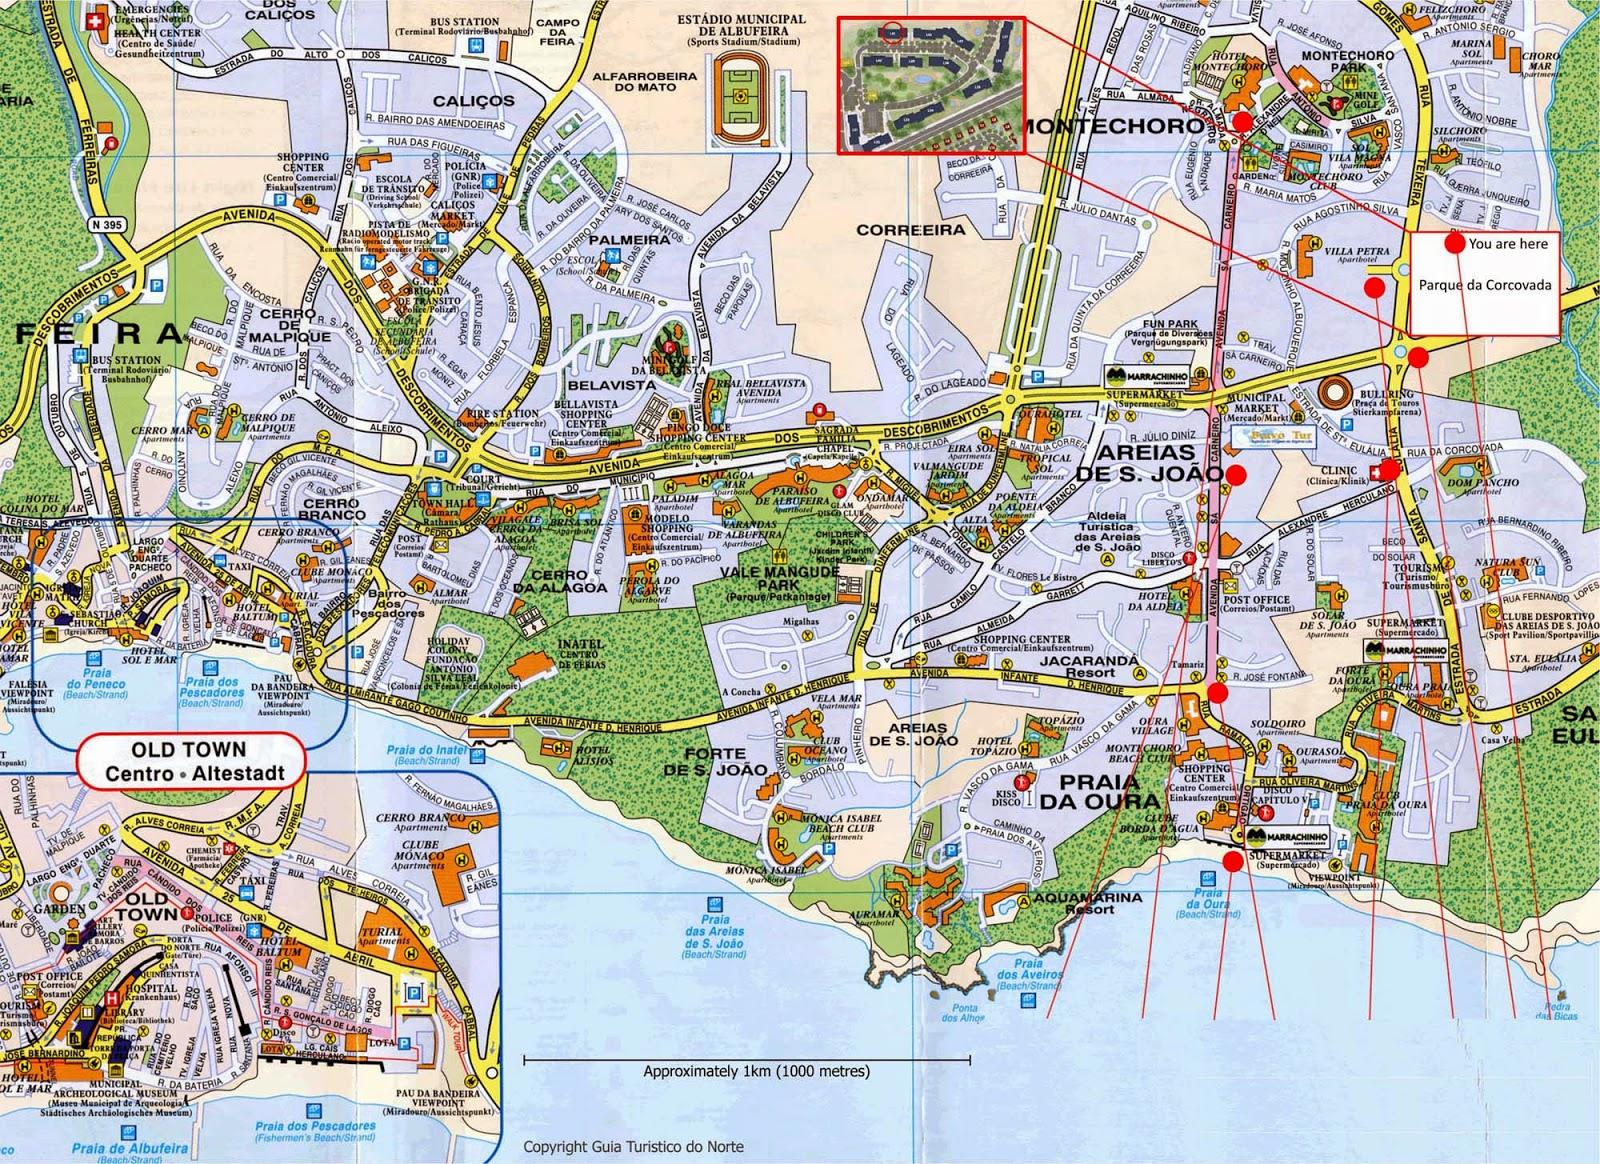 albufeira mapa map albufeira algarve albufeira mapa